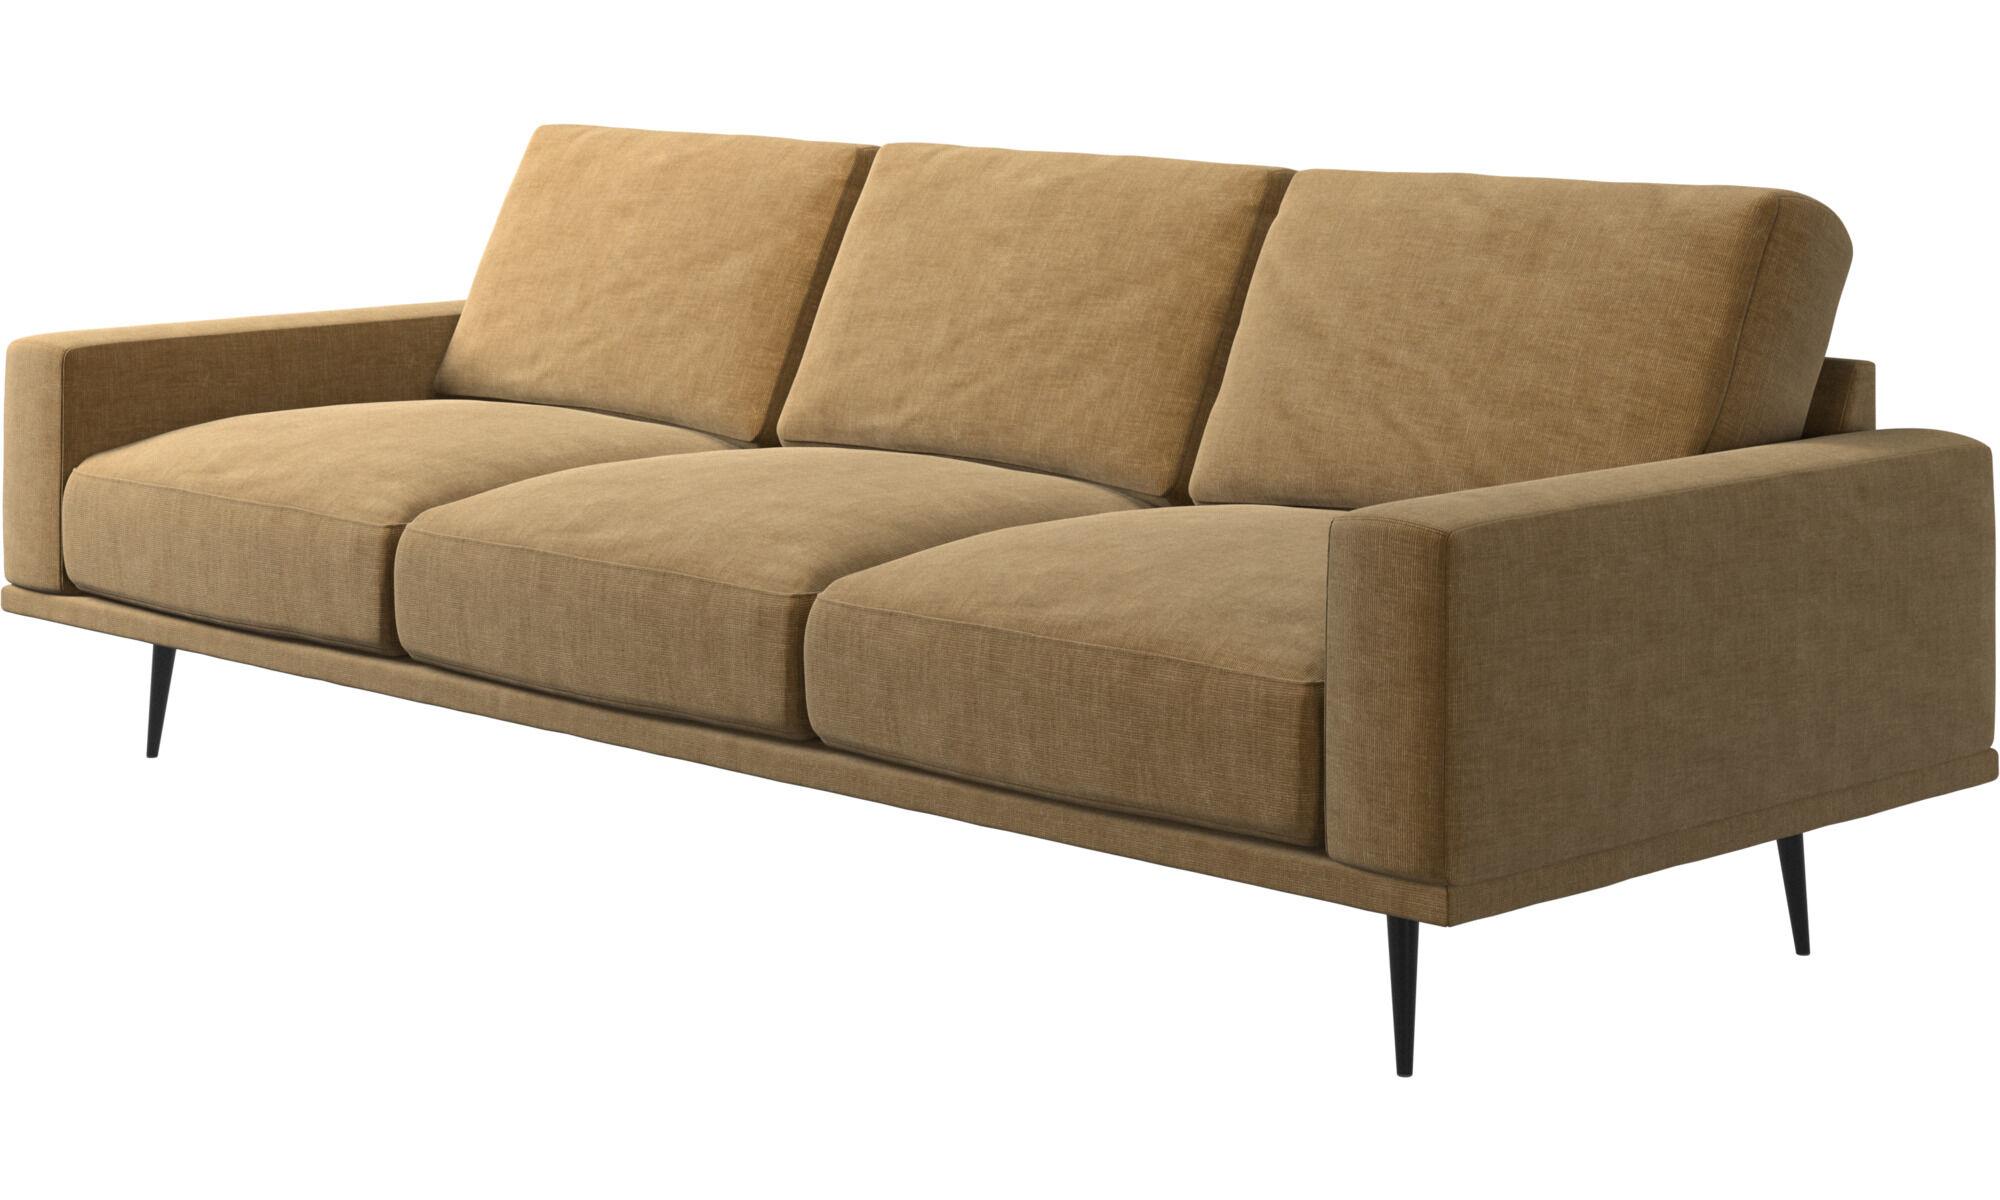 Superb ... New Designs   Carlton Sofa   Beige   Fabric ...